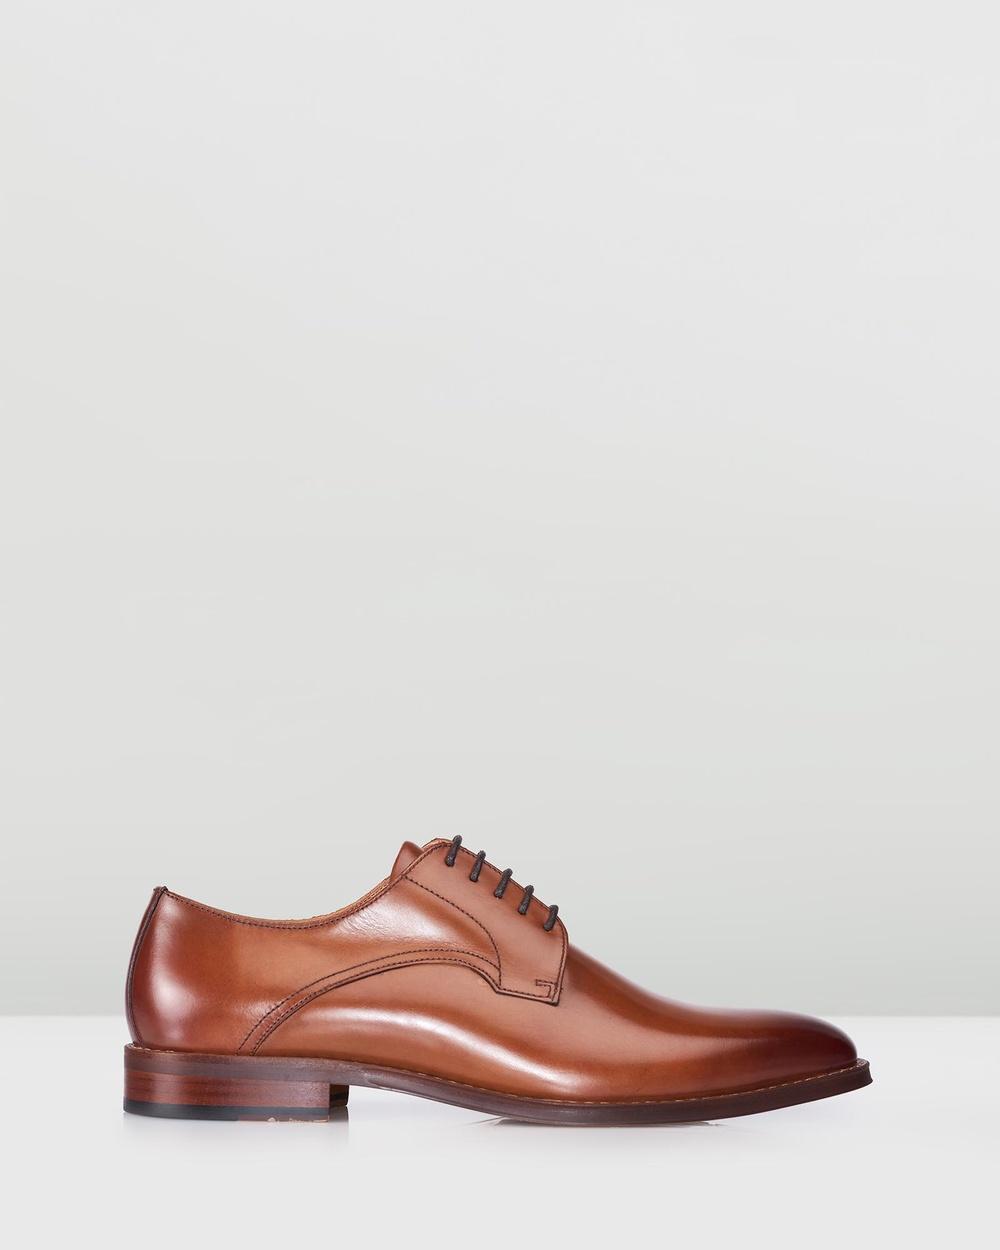 3 Wise Men The Bruce Dress Shoes Tan